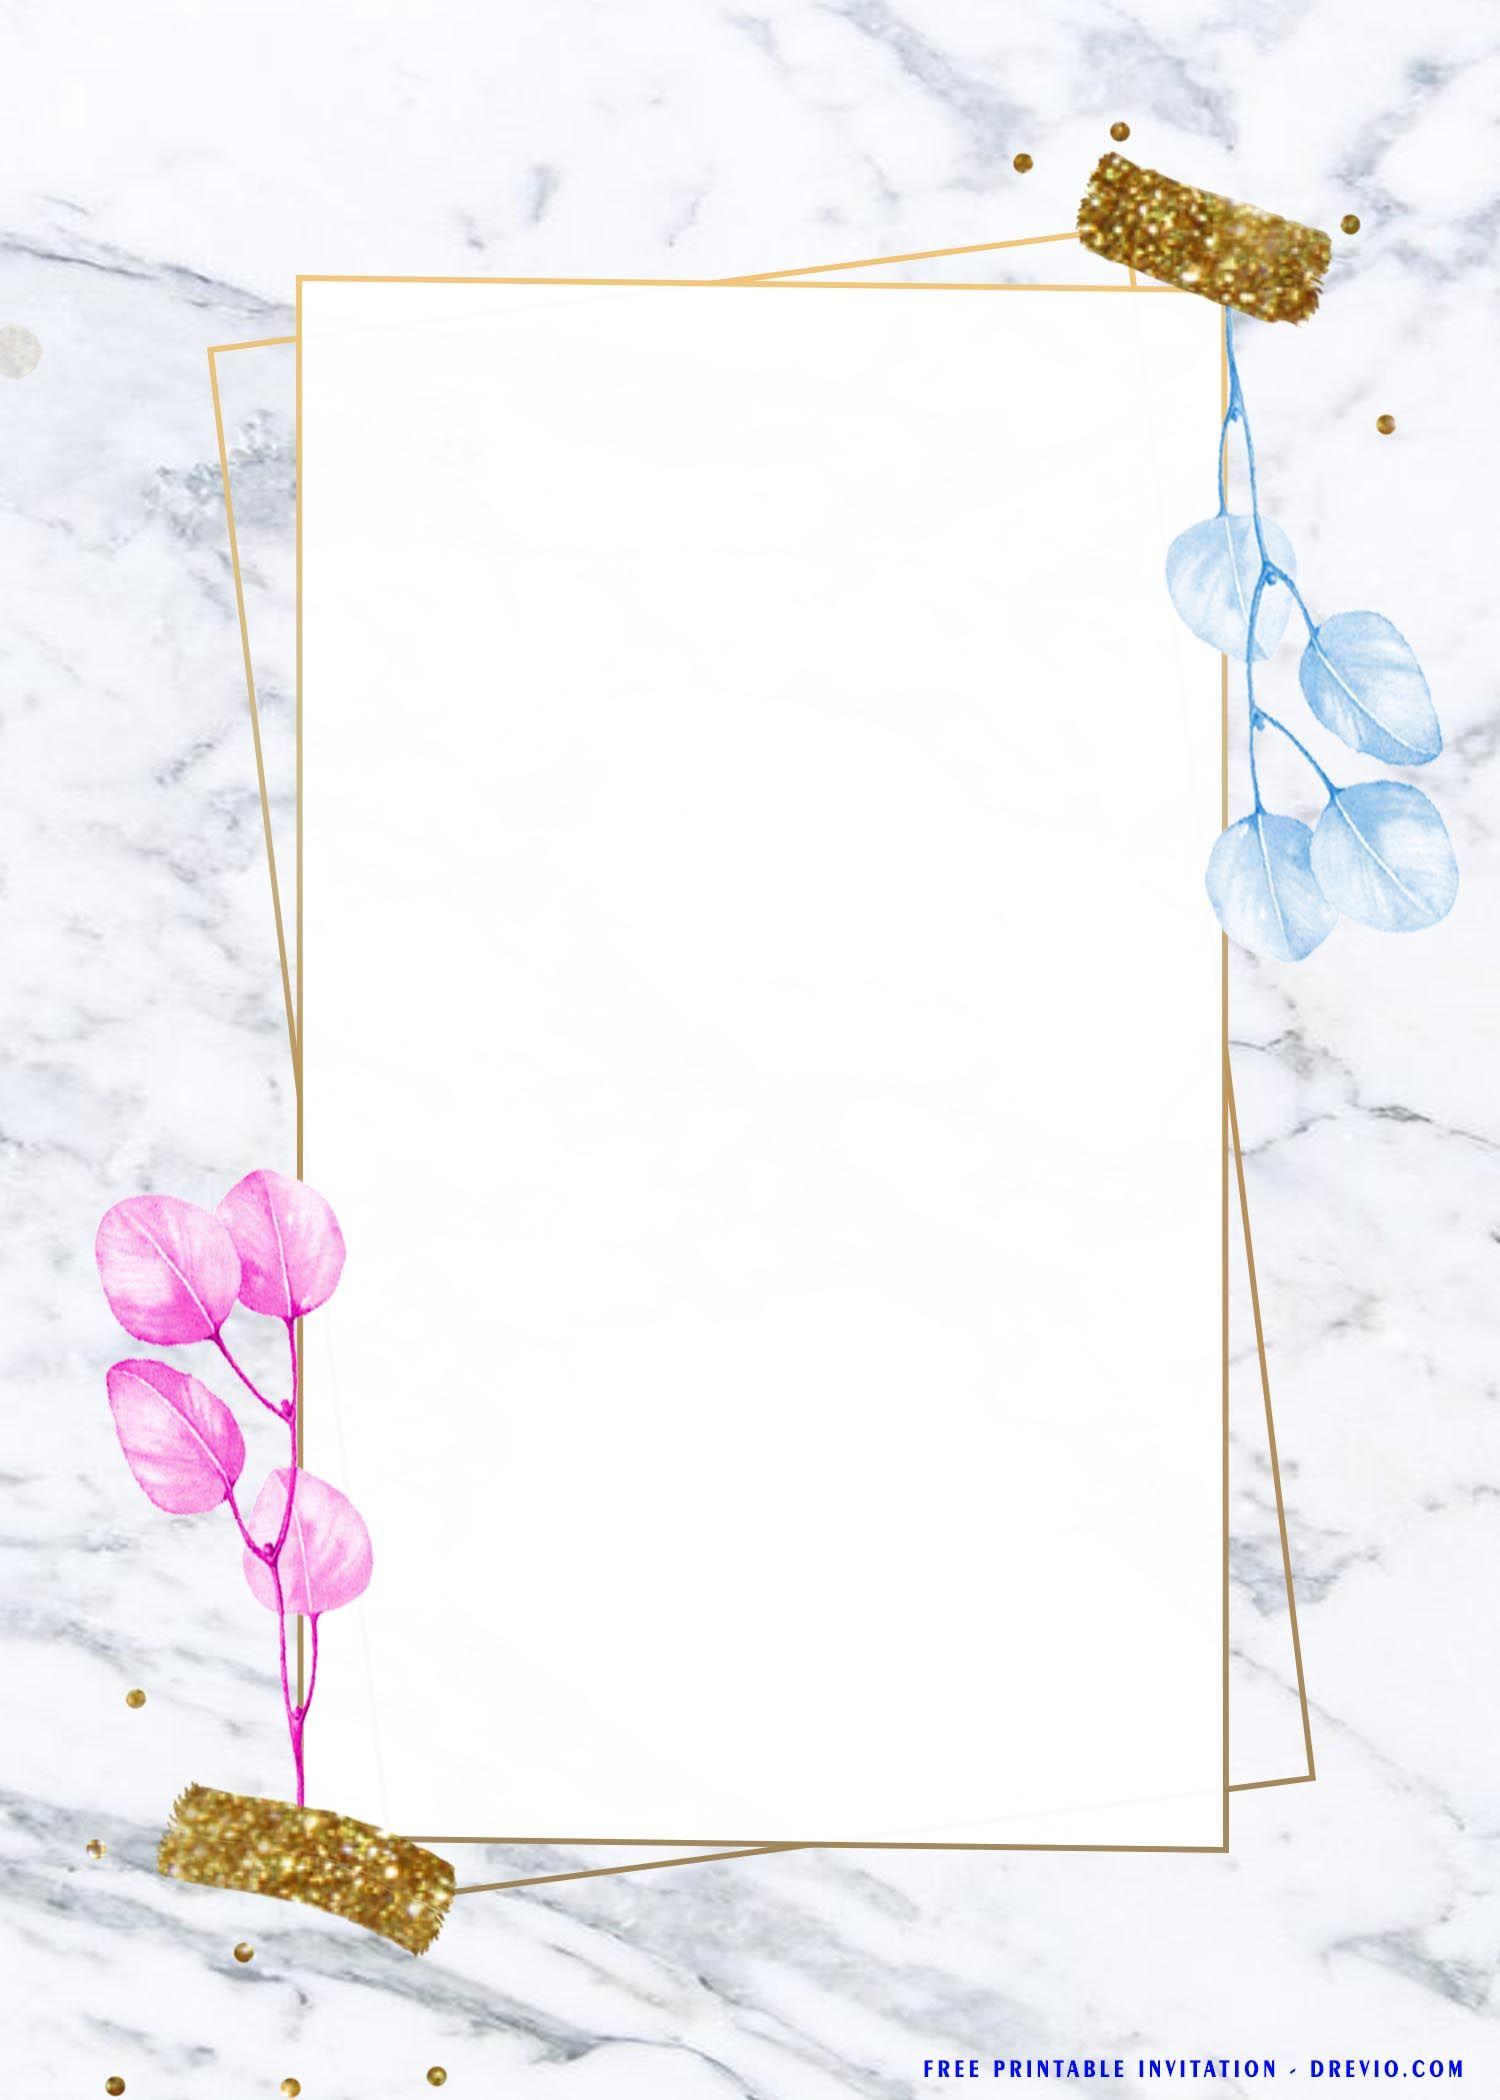 Free Printable Blue Eucalyptus Baby Shower Invitation Templates In 2021 Free Printable Birthday Invitations Baby Shower Invitations Printable Birthday Invitations